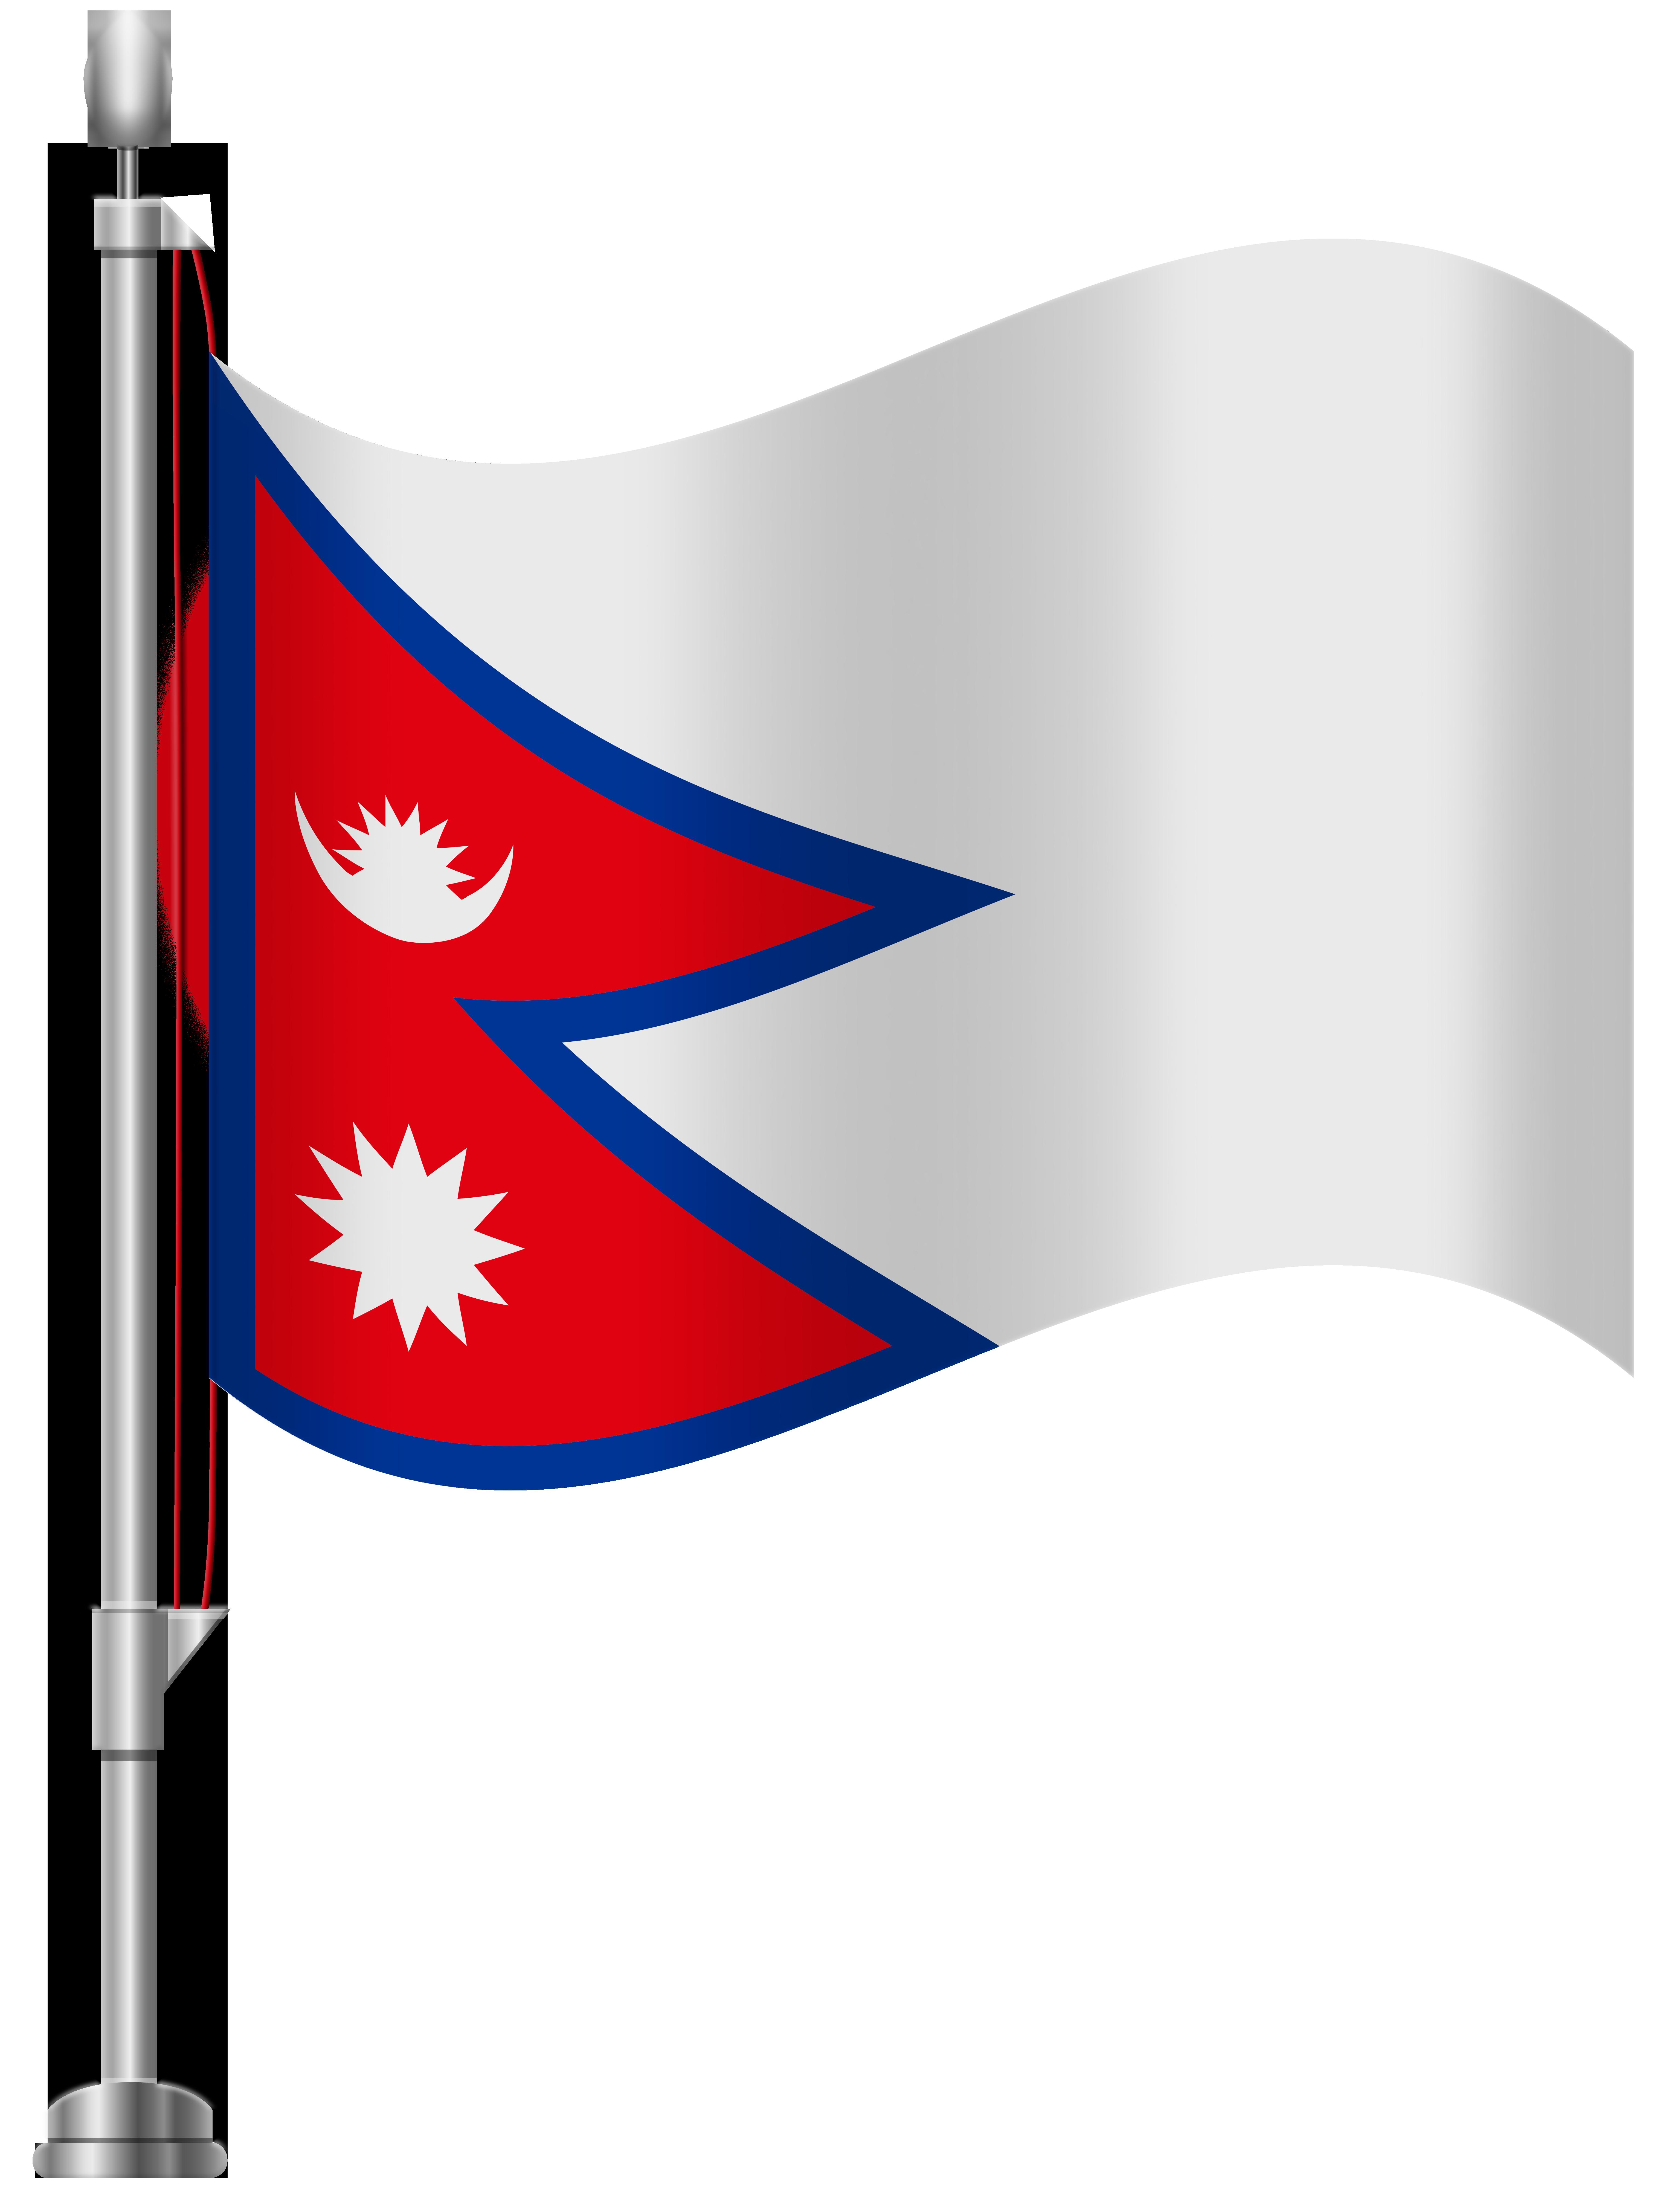 6141x8000 Nepal Flag Png Clip Art